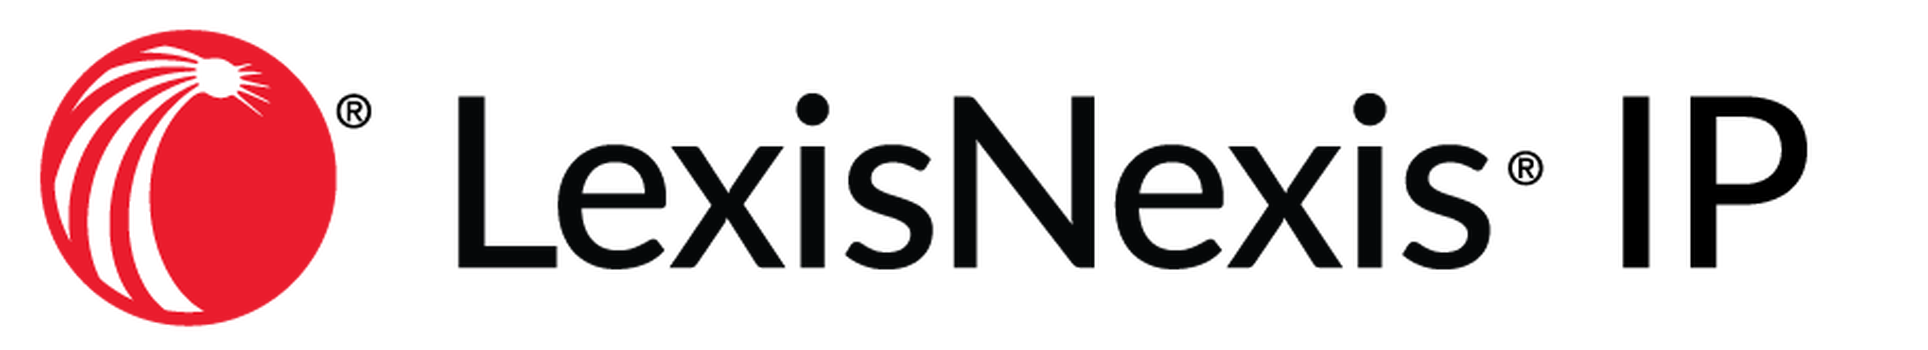 Reed Tech logo